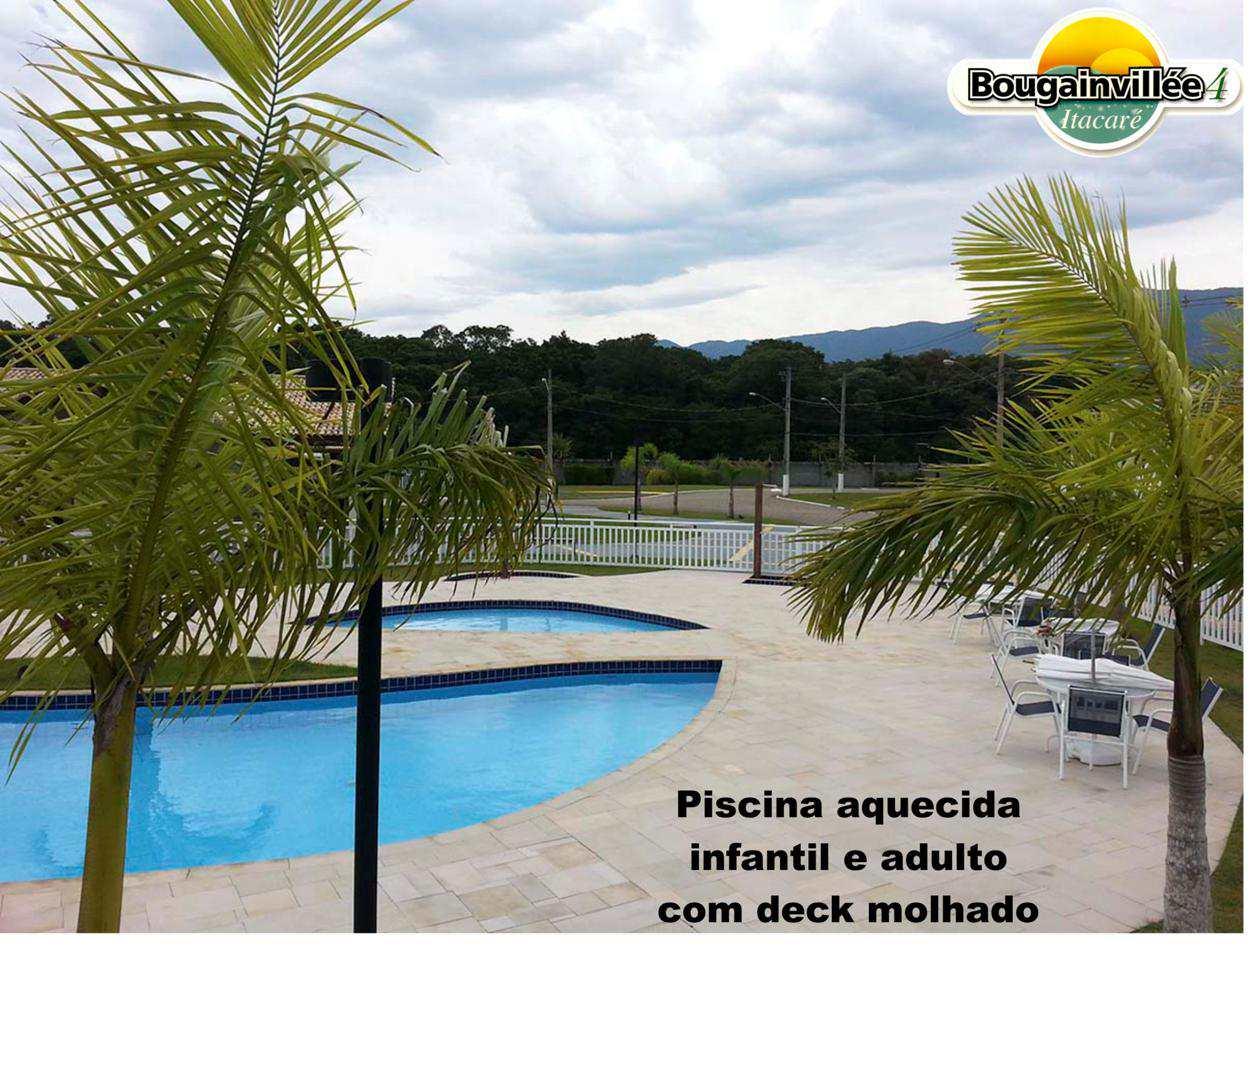 Bougainvillee 4 Piscina 02